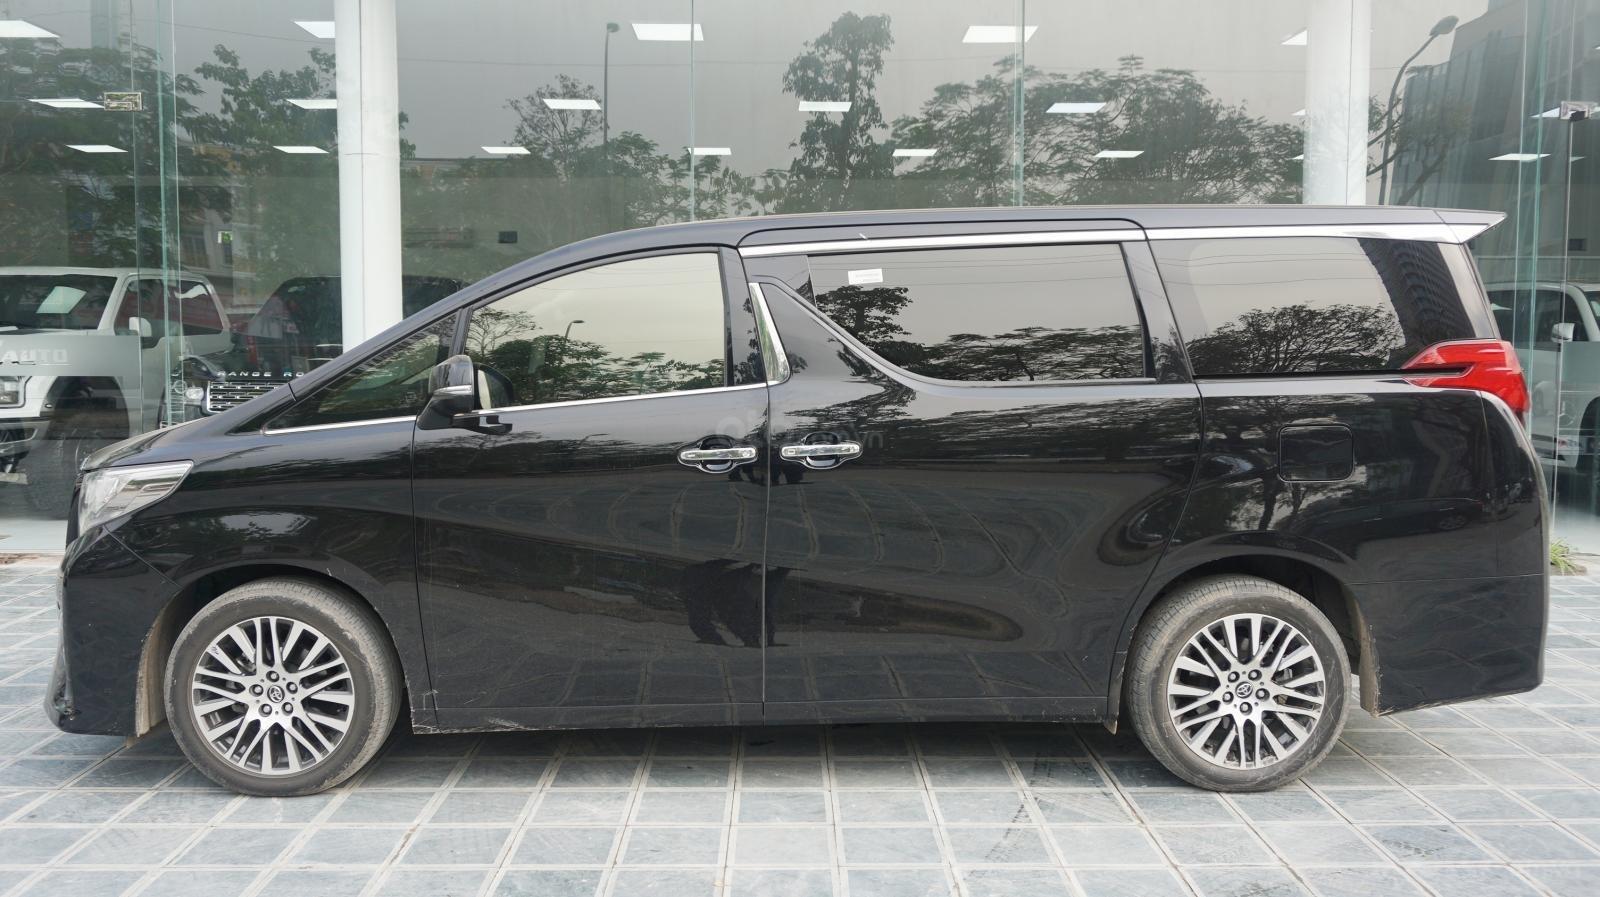 Bán Toyota Alphard 3.5L - V6 sản xuất 2017 model 2018, Mr Huân 0981.0101.61 (10)